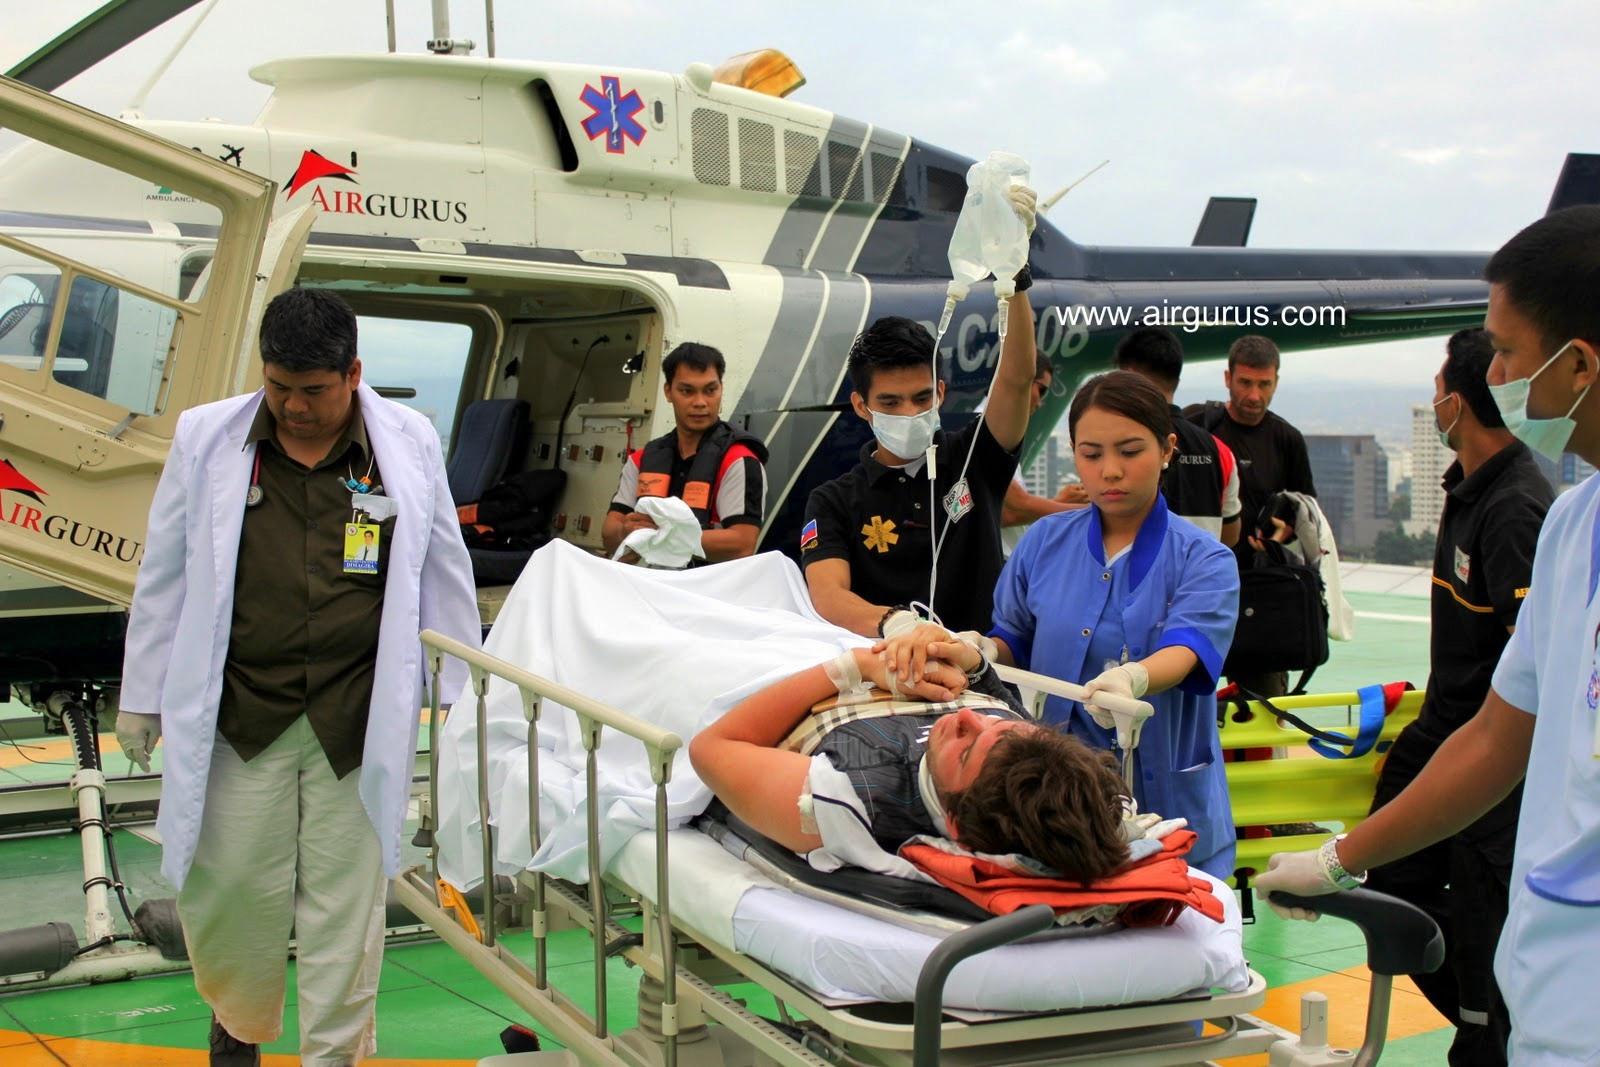 Medical Evacuation Insurance Travel